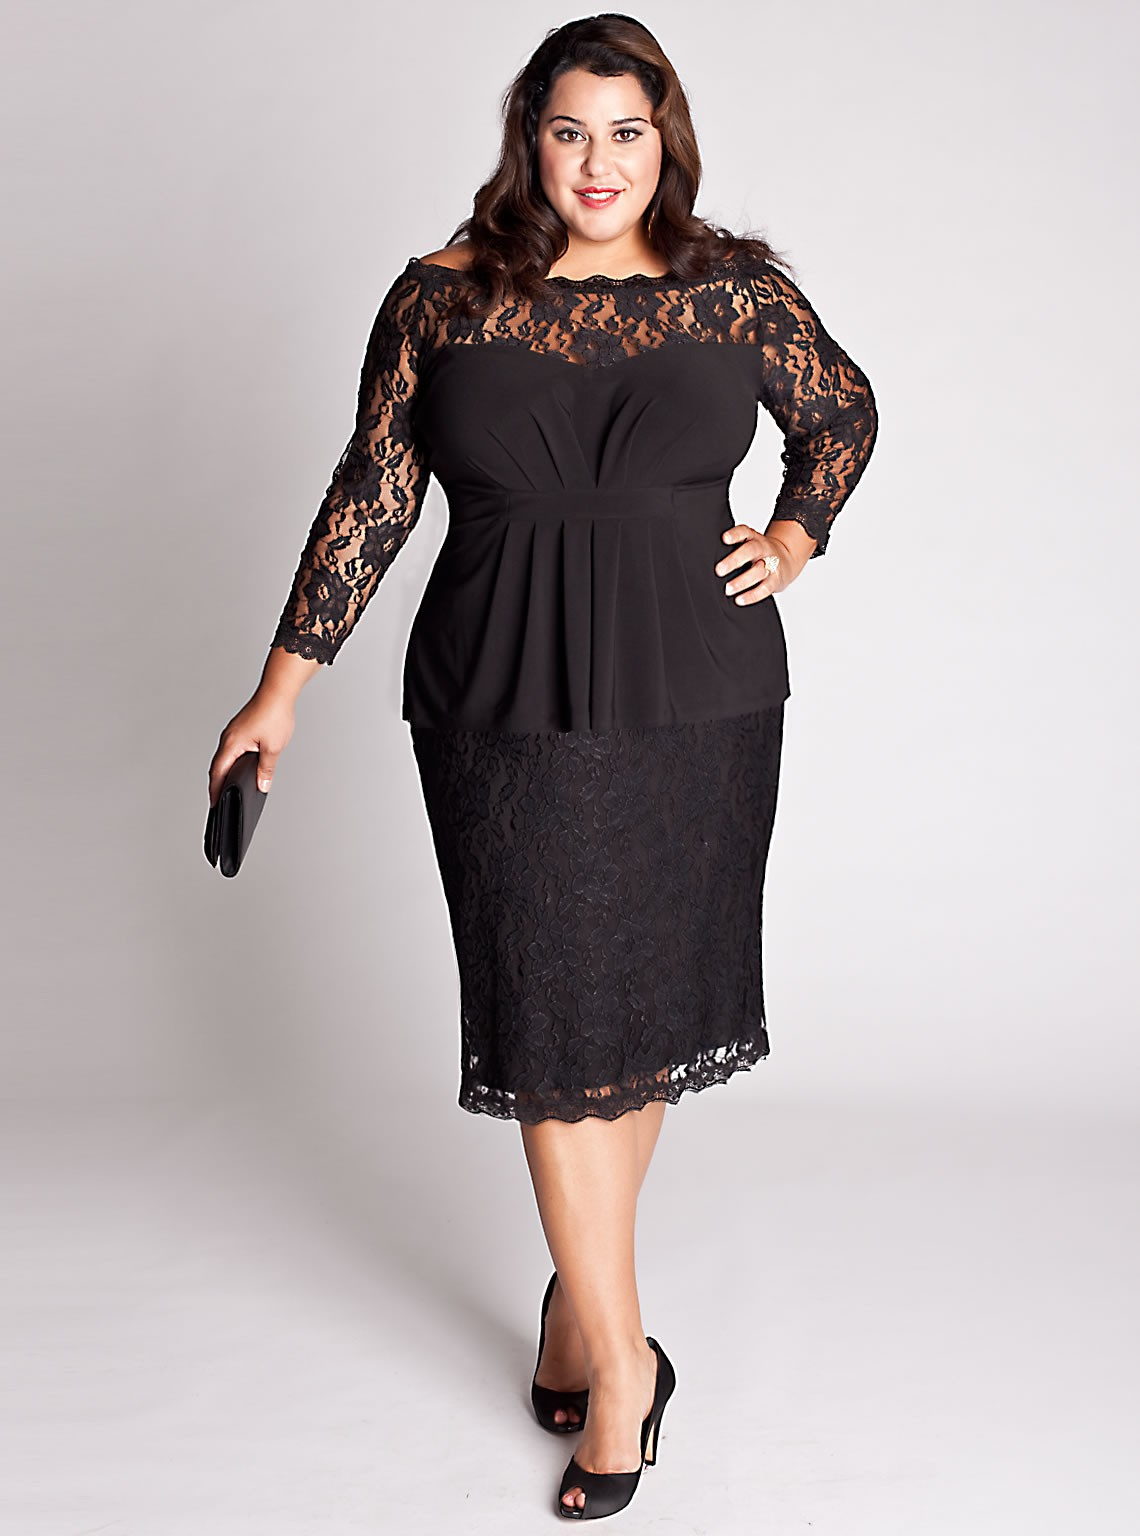 dresses for plus size women emejing plus size clothing dresses ideas plus size clothing CBRGZJZ